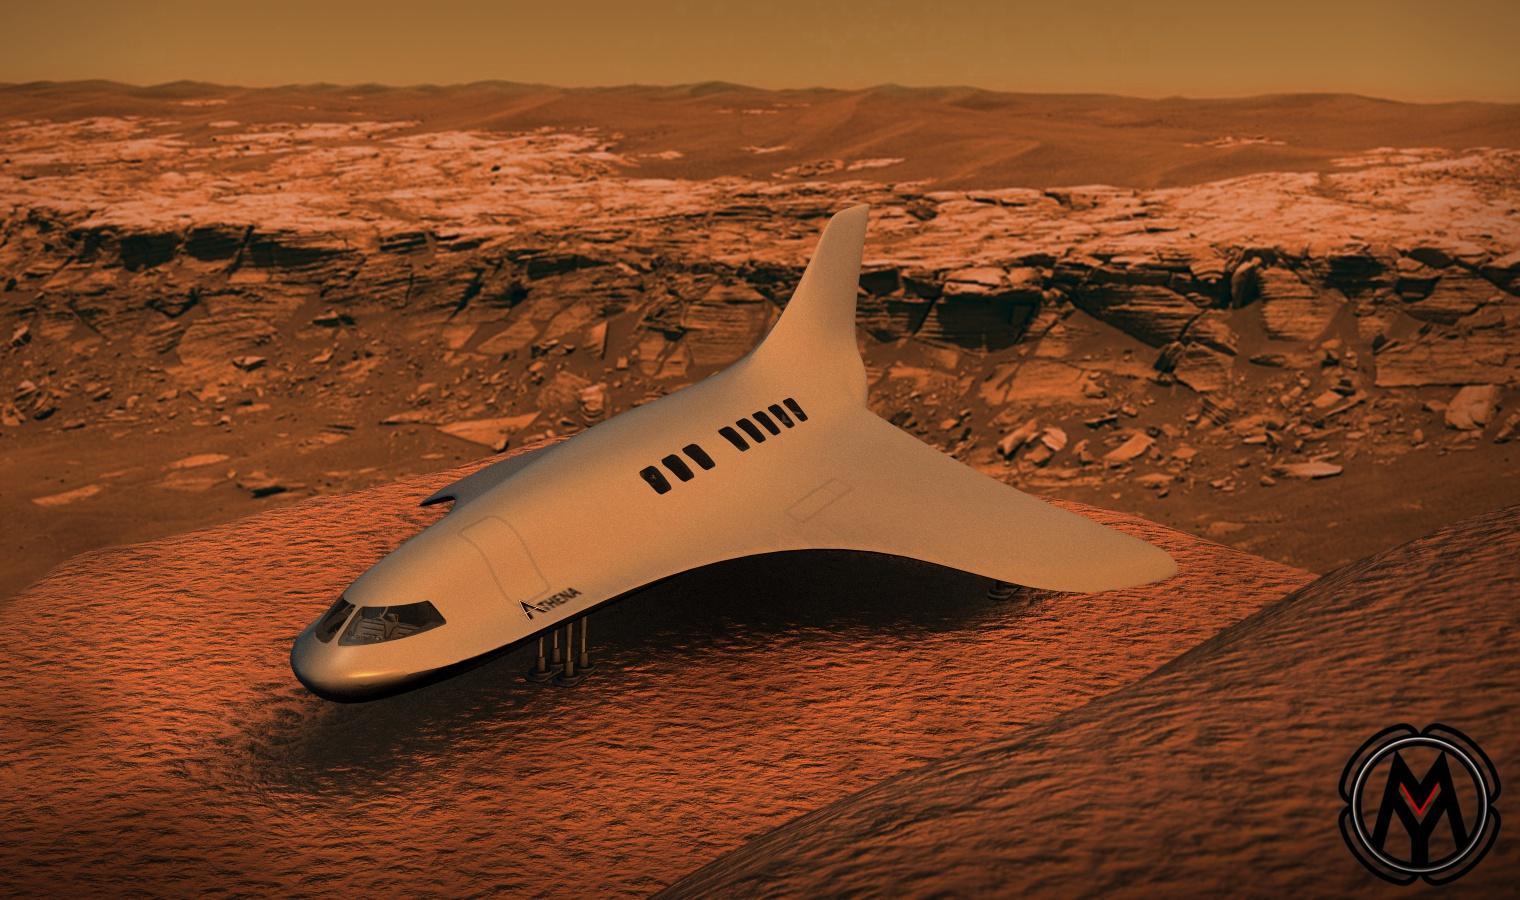 spacecraft sent to mars - photo #25